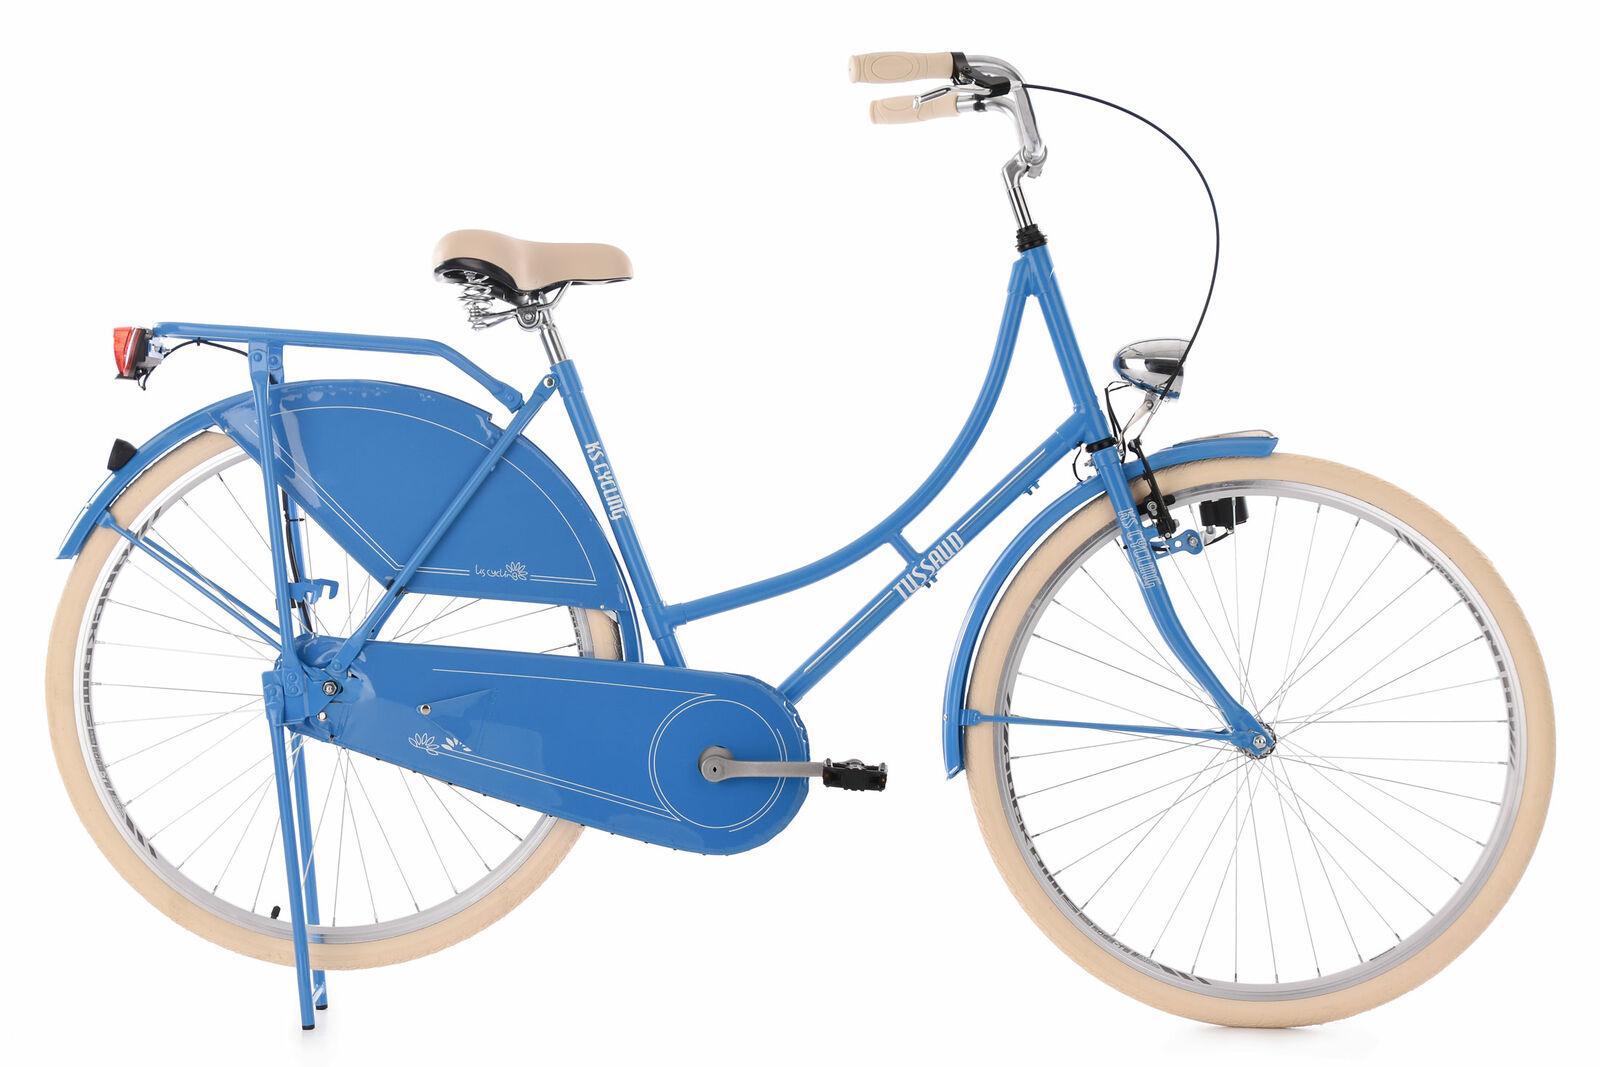 Hollandrad KS Cycling Tussaud 28 Zoll 53cm 1 Gang Damen - hellblau